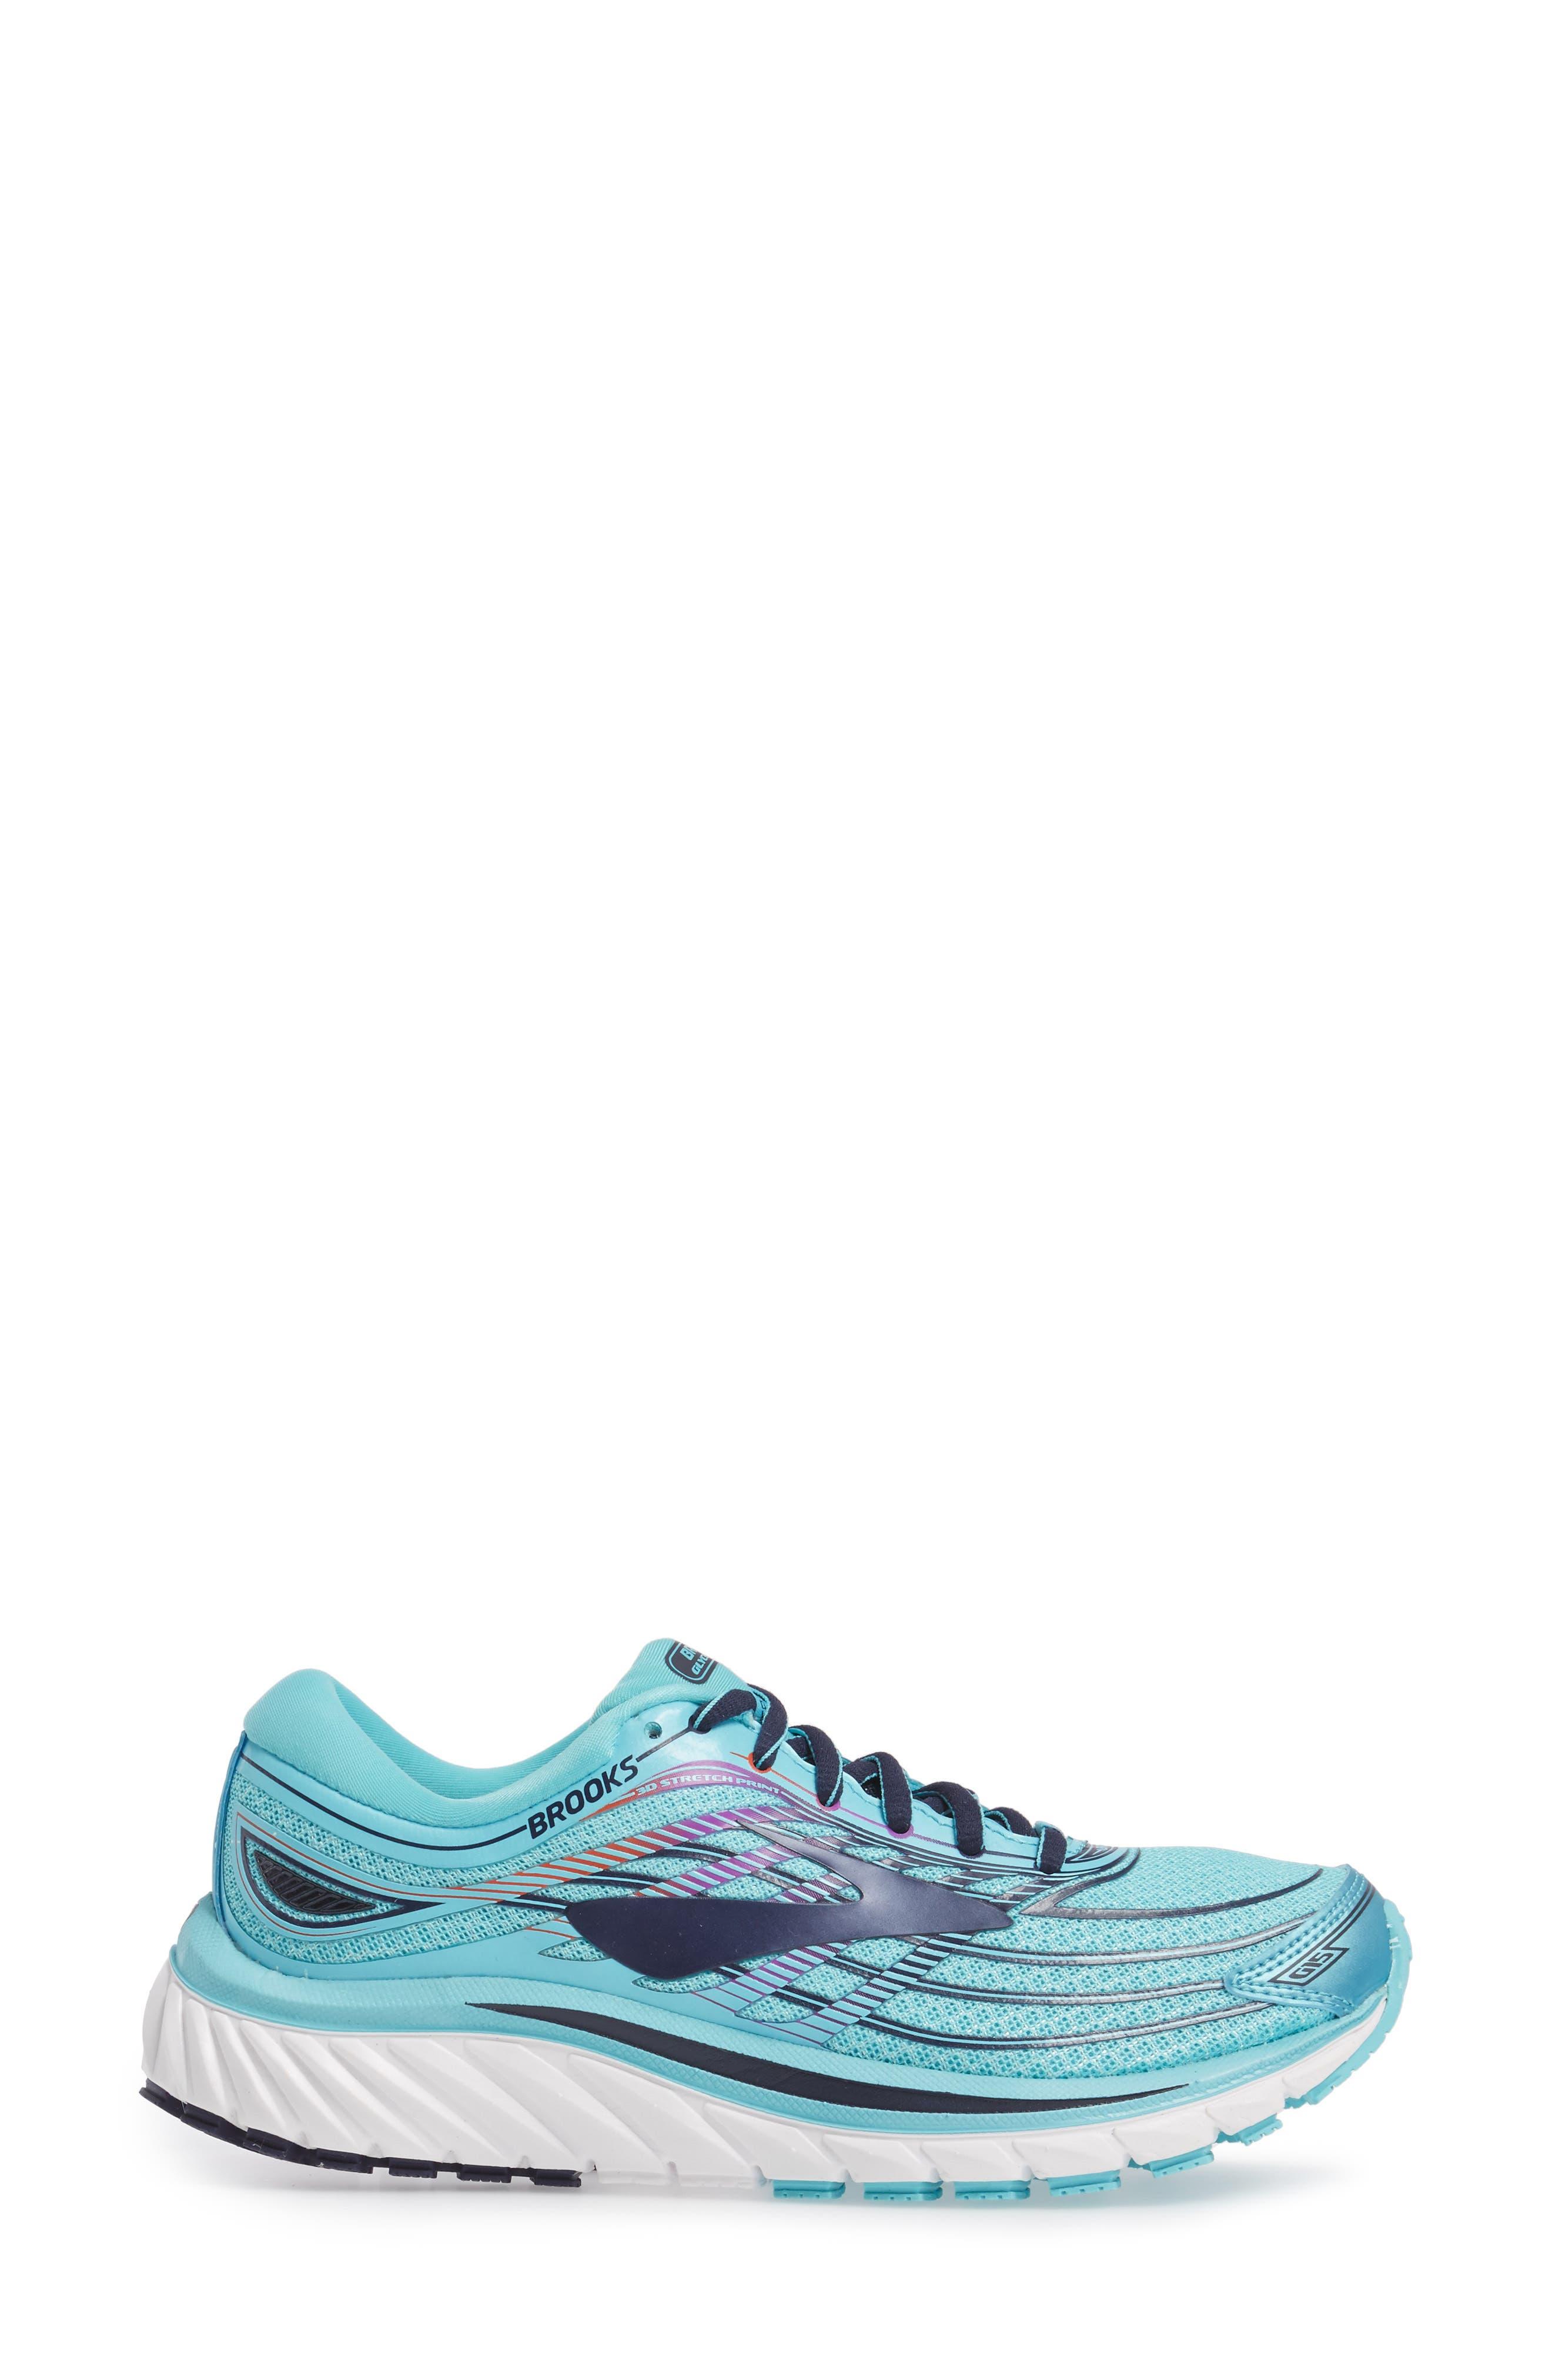 Alternate Image 3  - Brooks Glycerin 15 Running Shoe (Women)